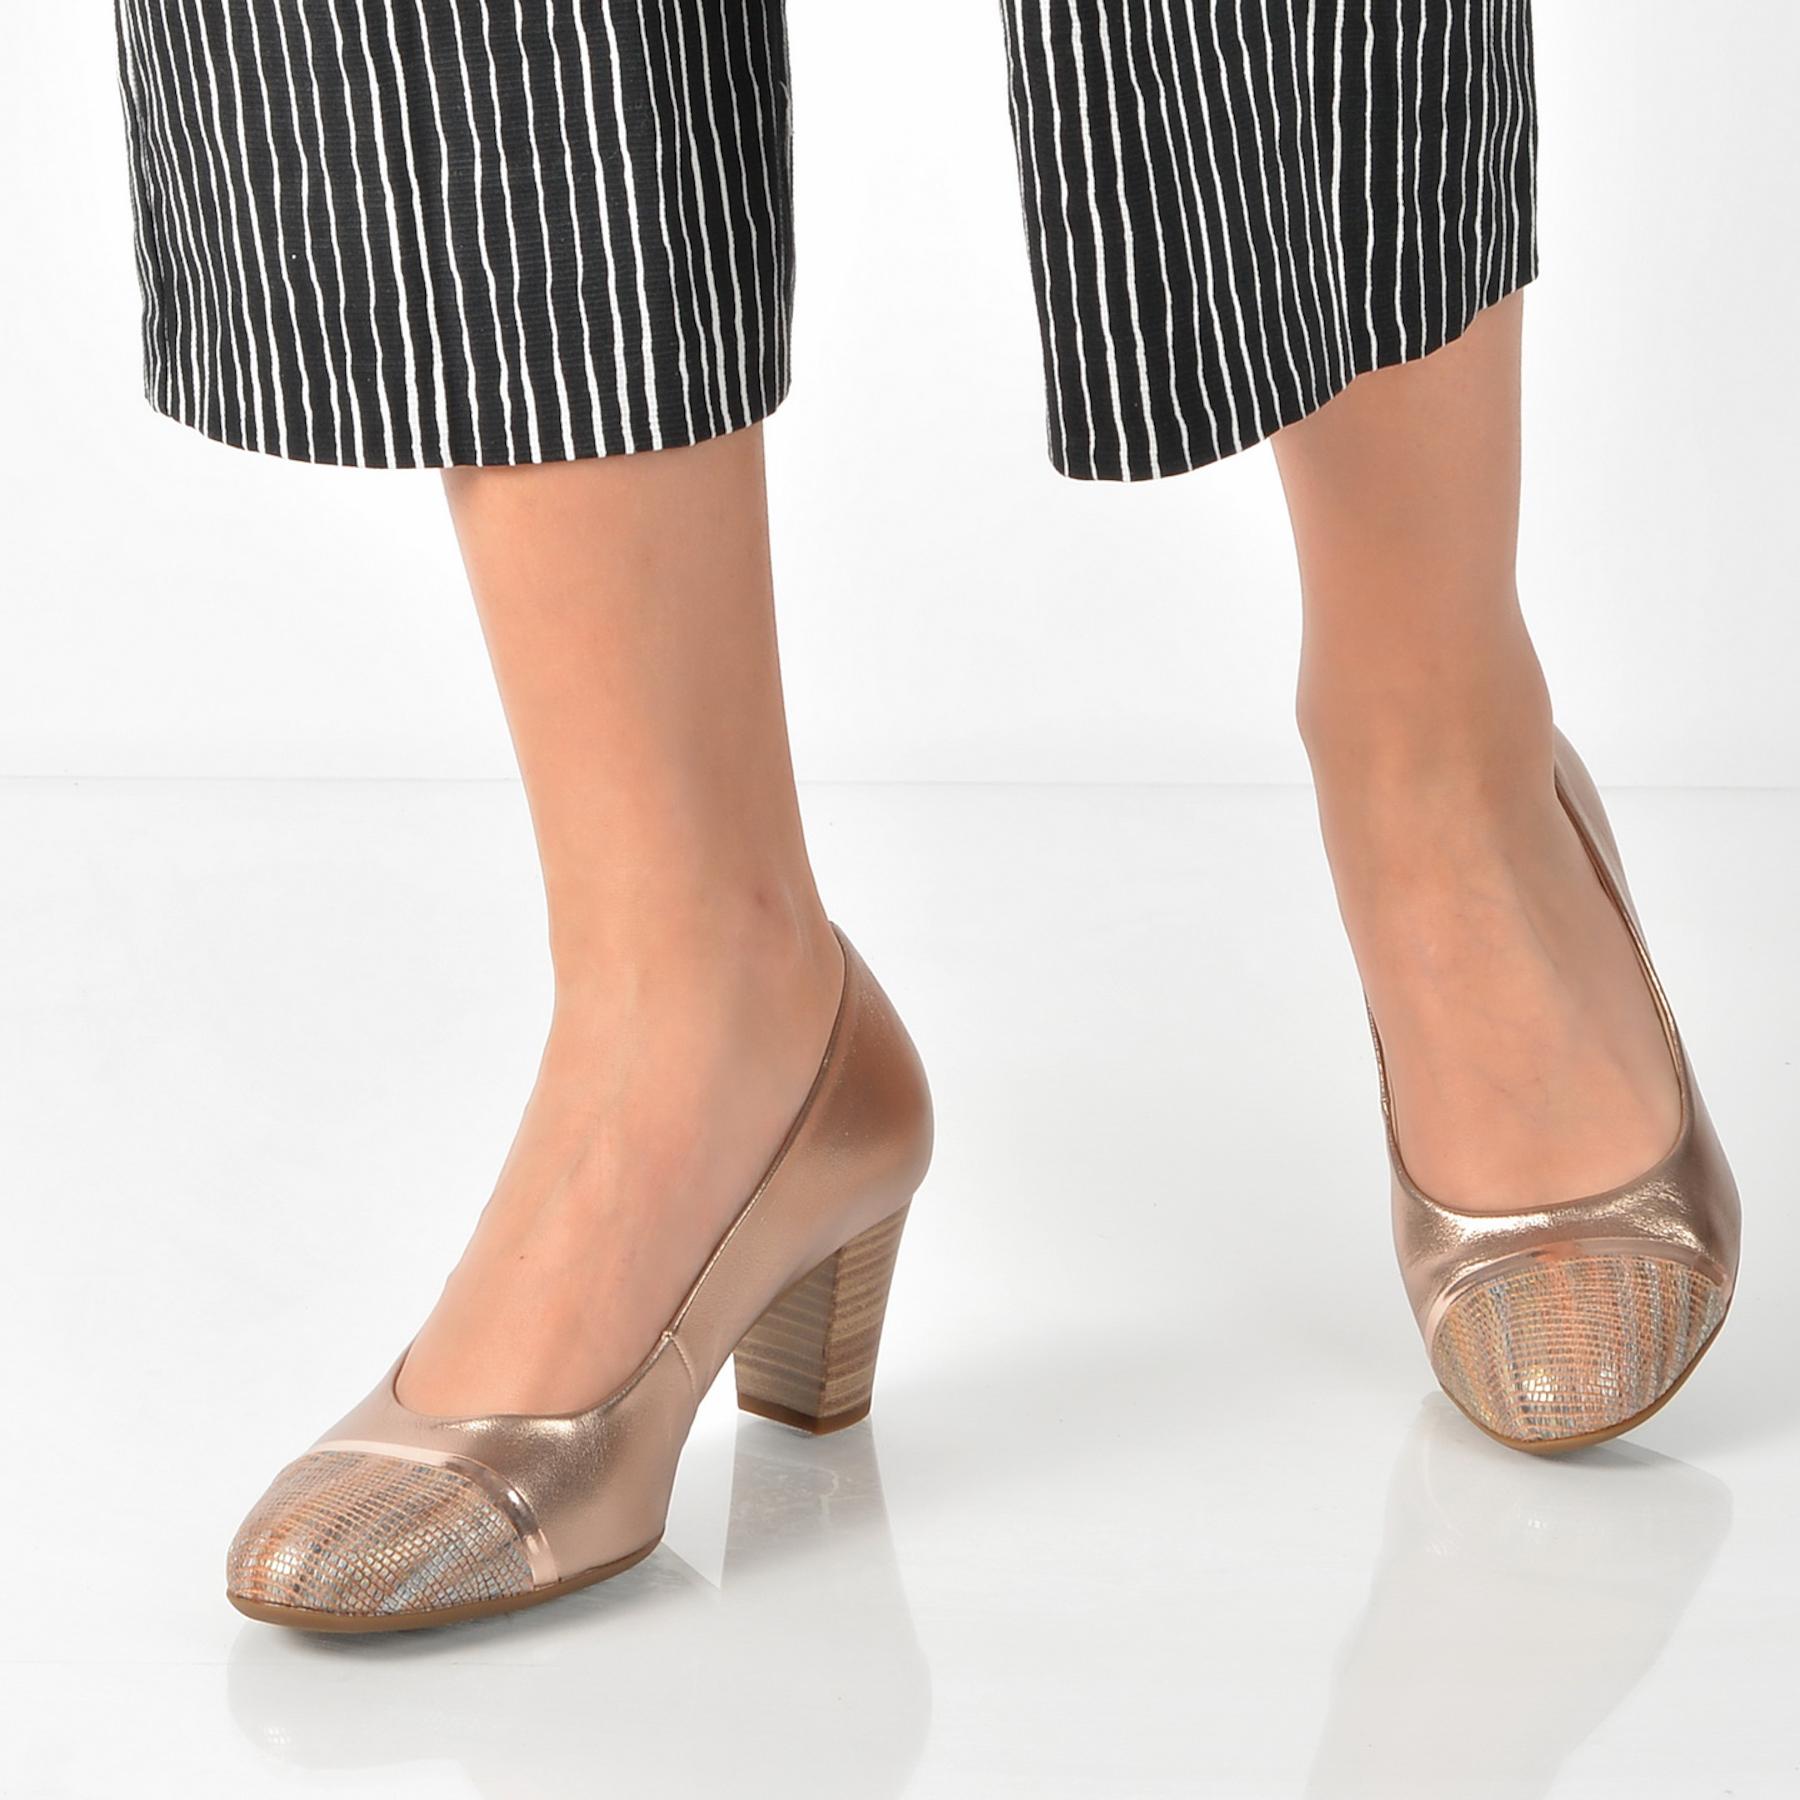 Pantofi Gabor Aurii, 82162, Din Piele Naturala